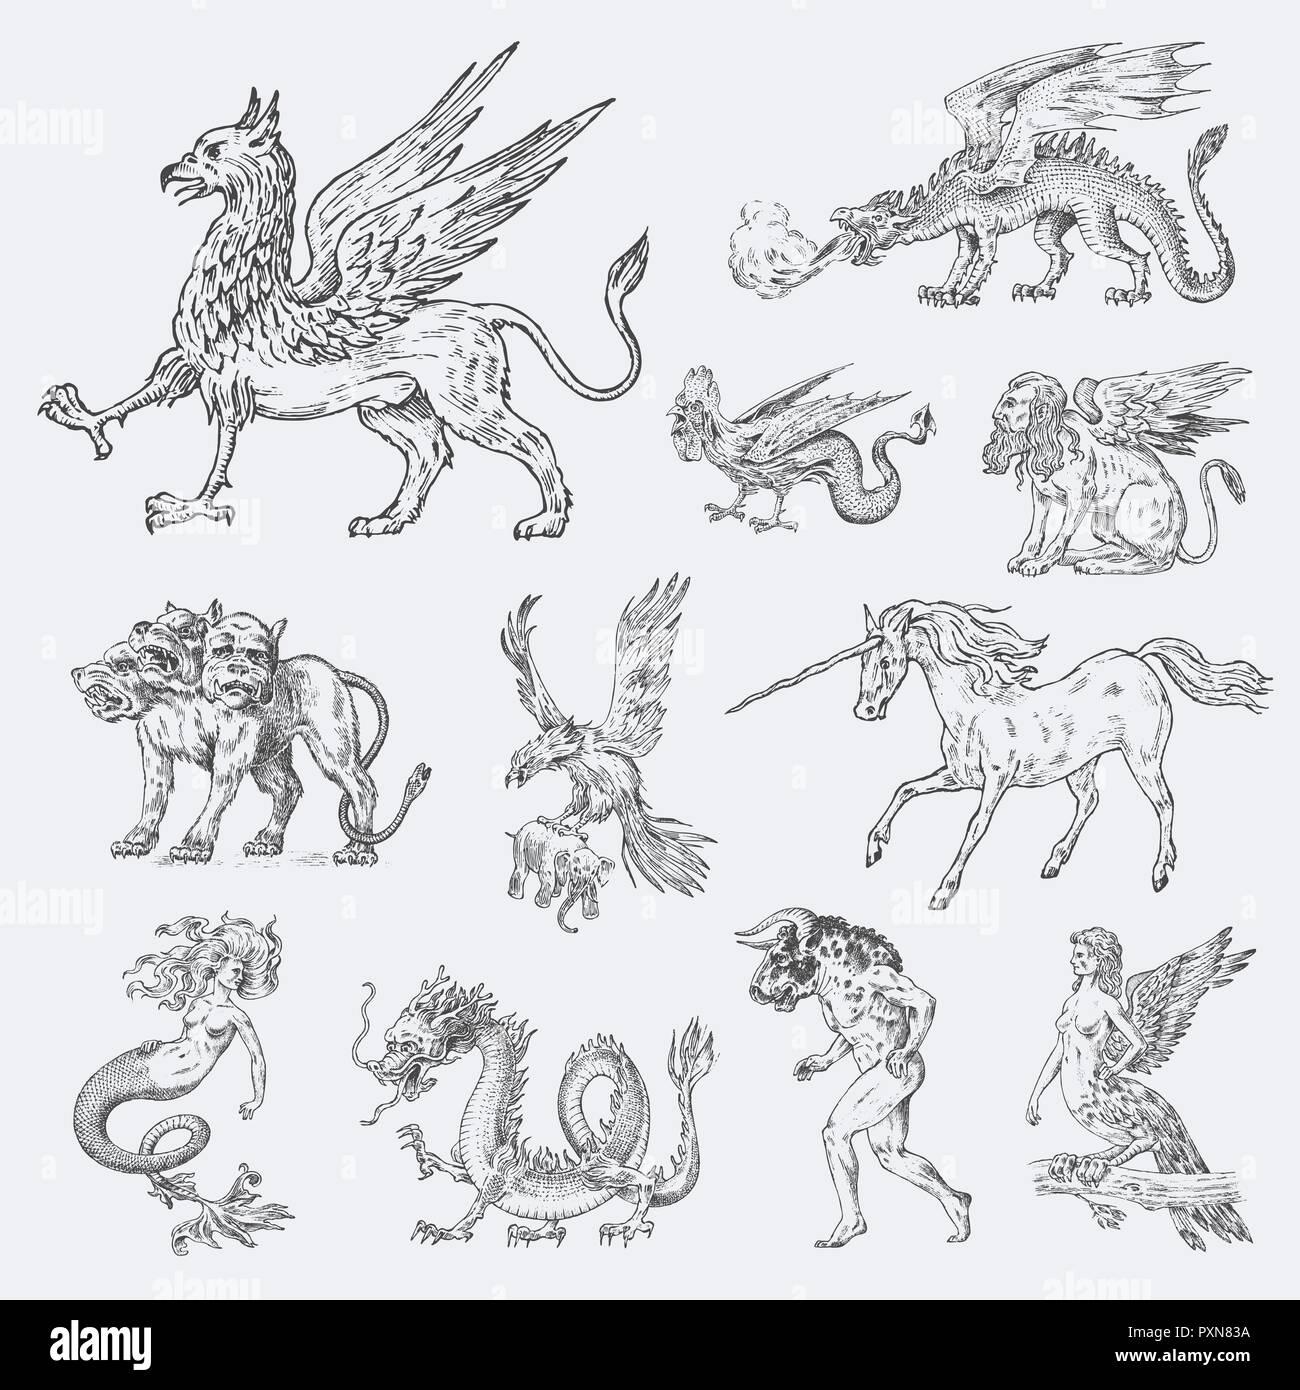 Tribal Dragon Tattoo Imágenes De Stock Tribal Dragon Tattoo Fotos